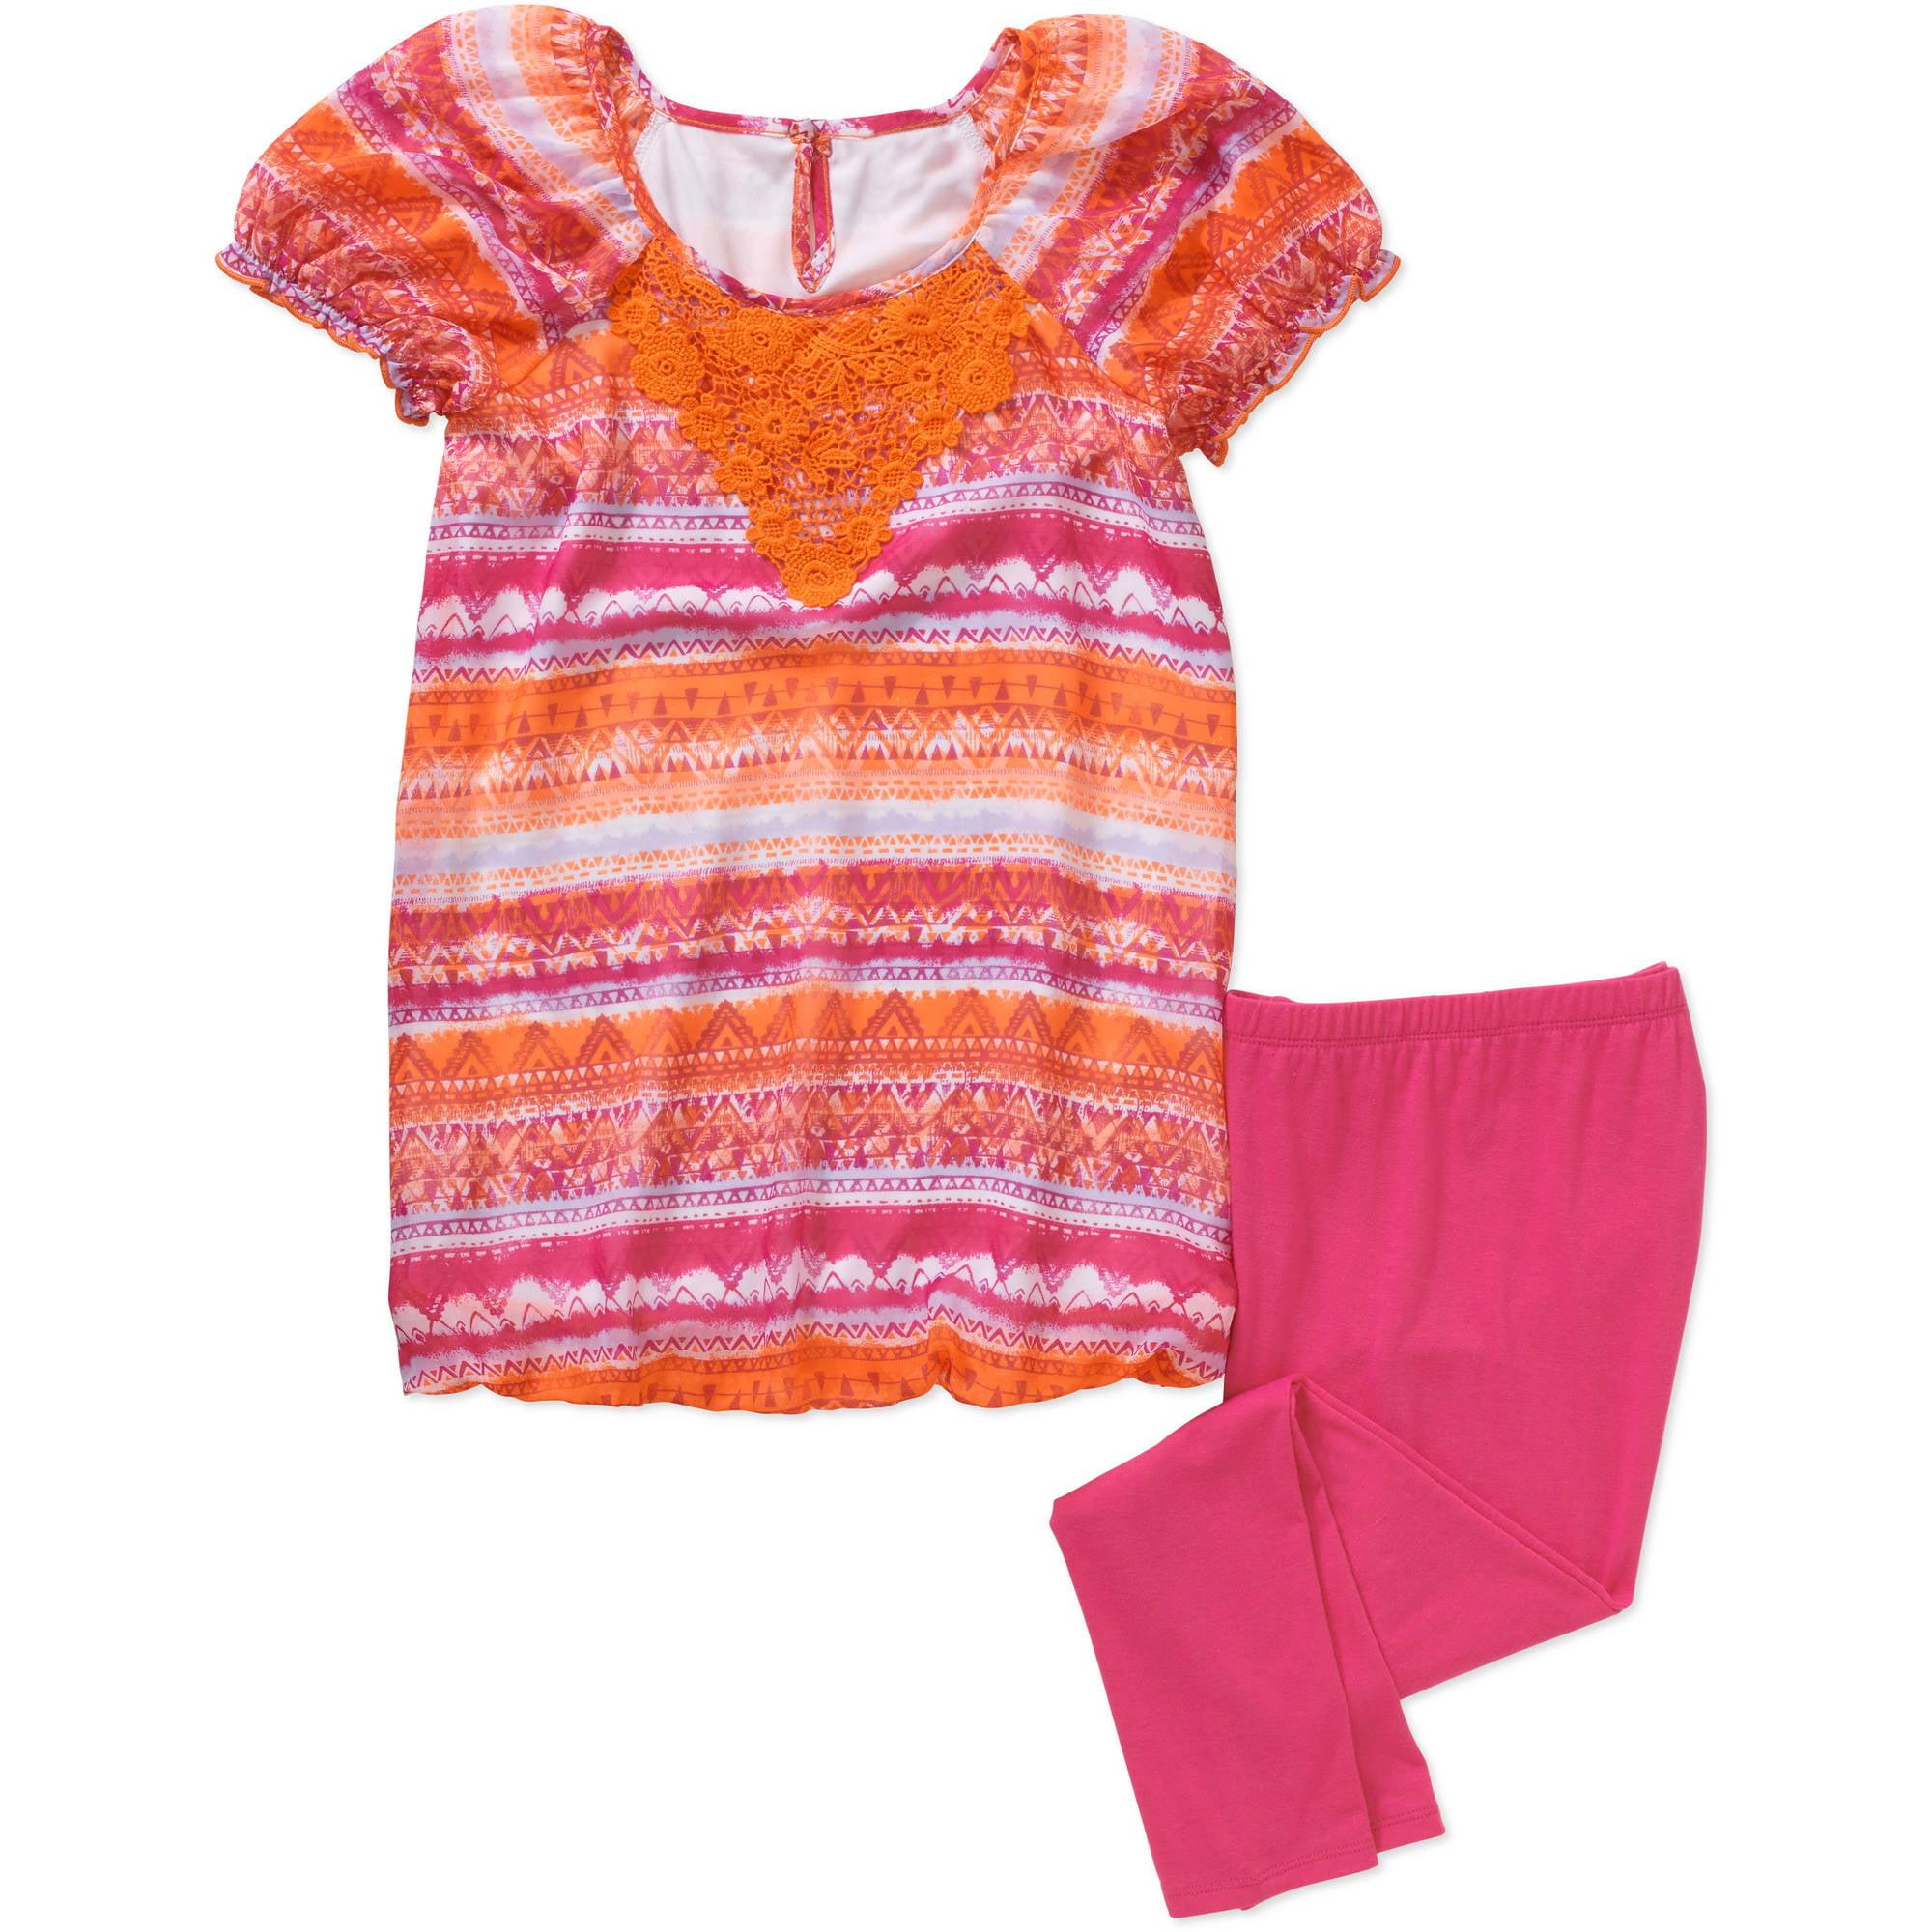 George Girls' Cap Sleeve Crochet Chiffon  Bubble Top and Legging Set